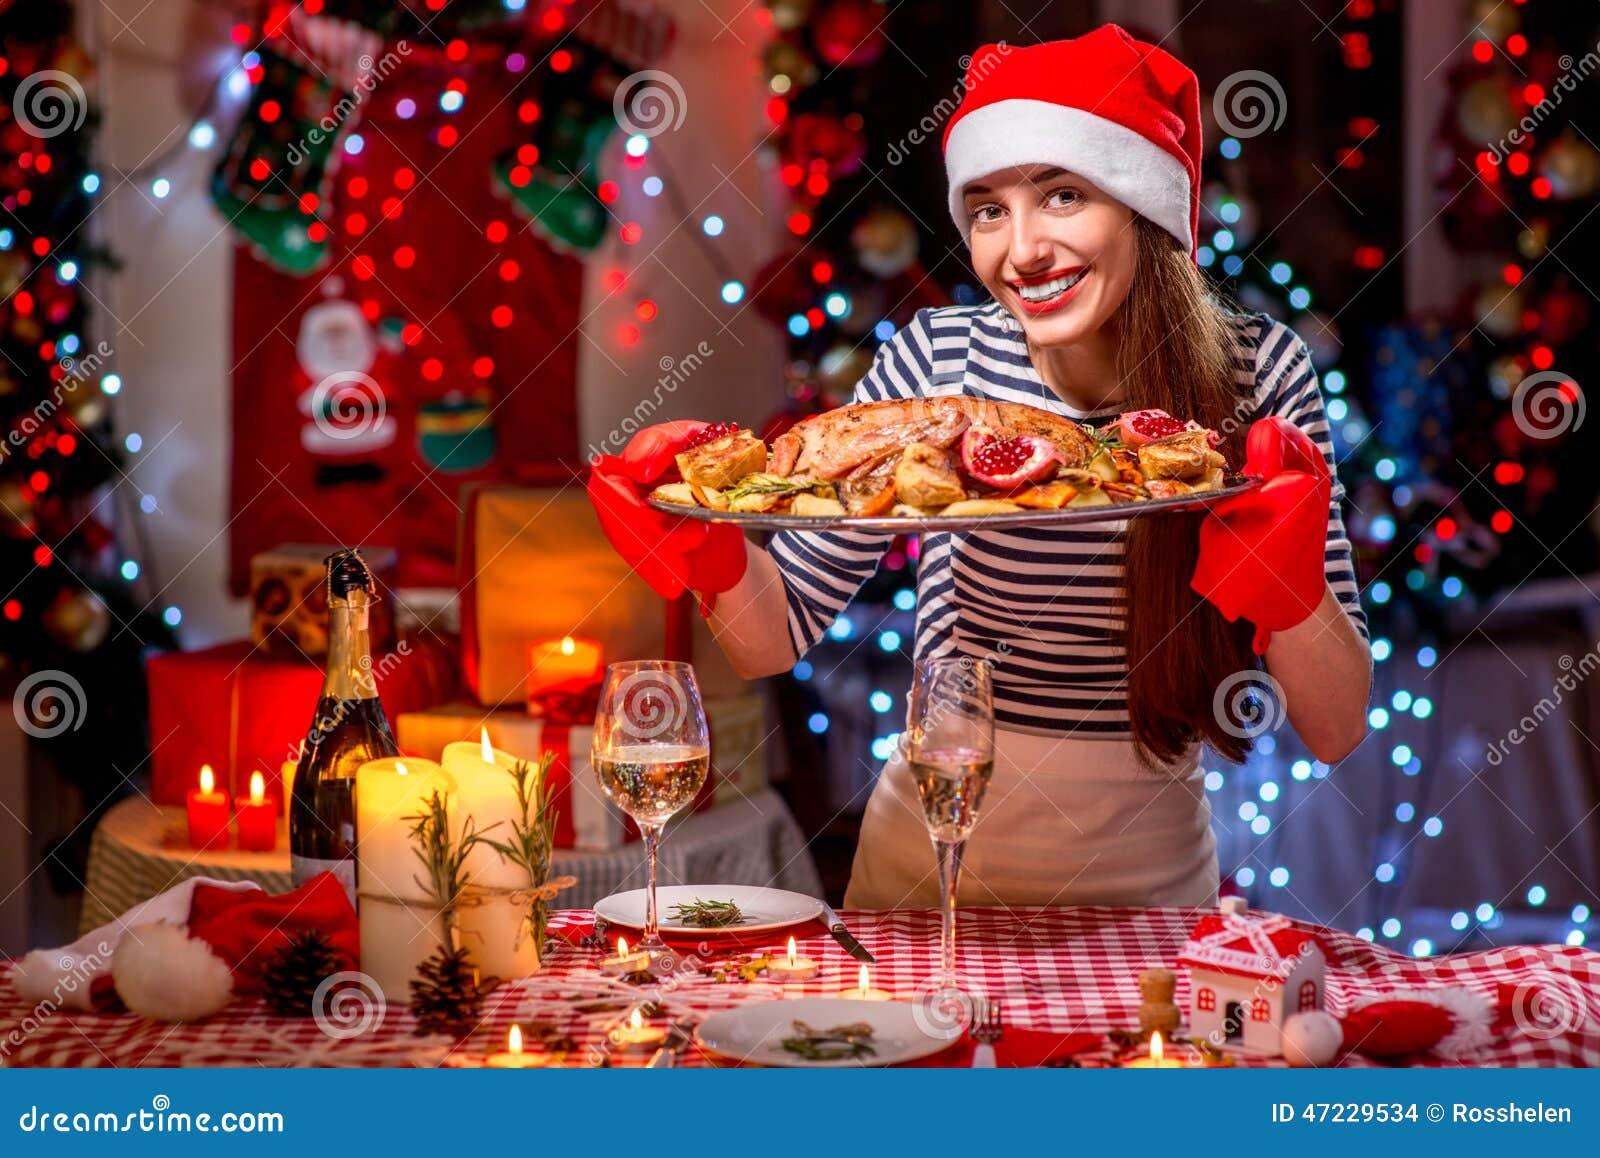 Woman Preparing For Christmas Dinner Stock Photo - Image: 47229534